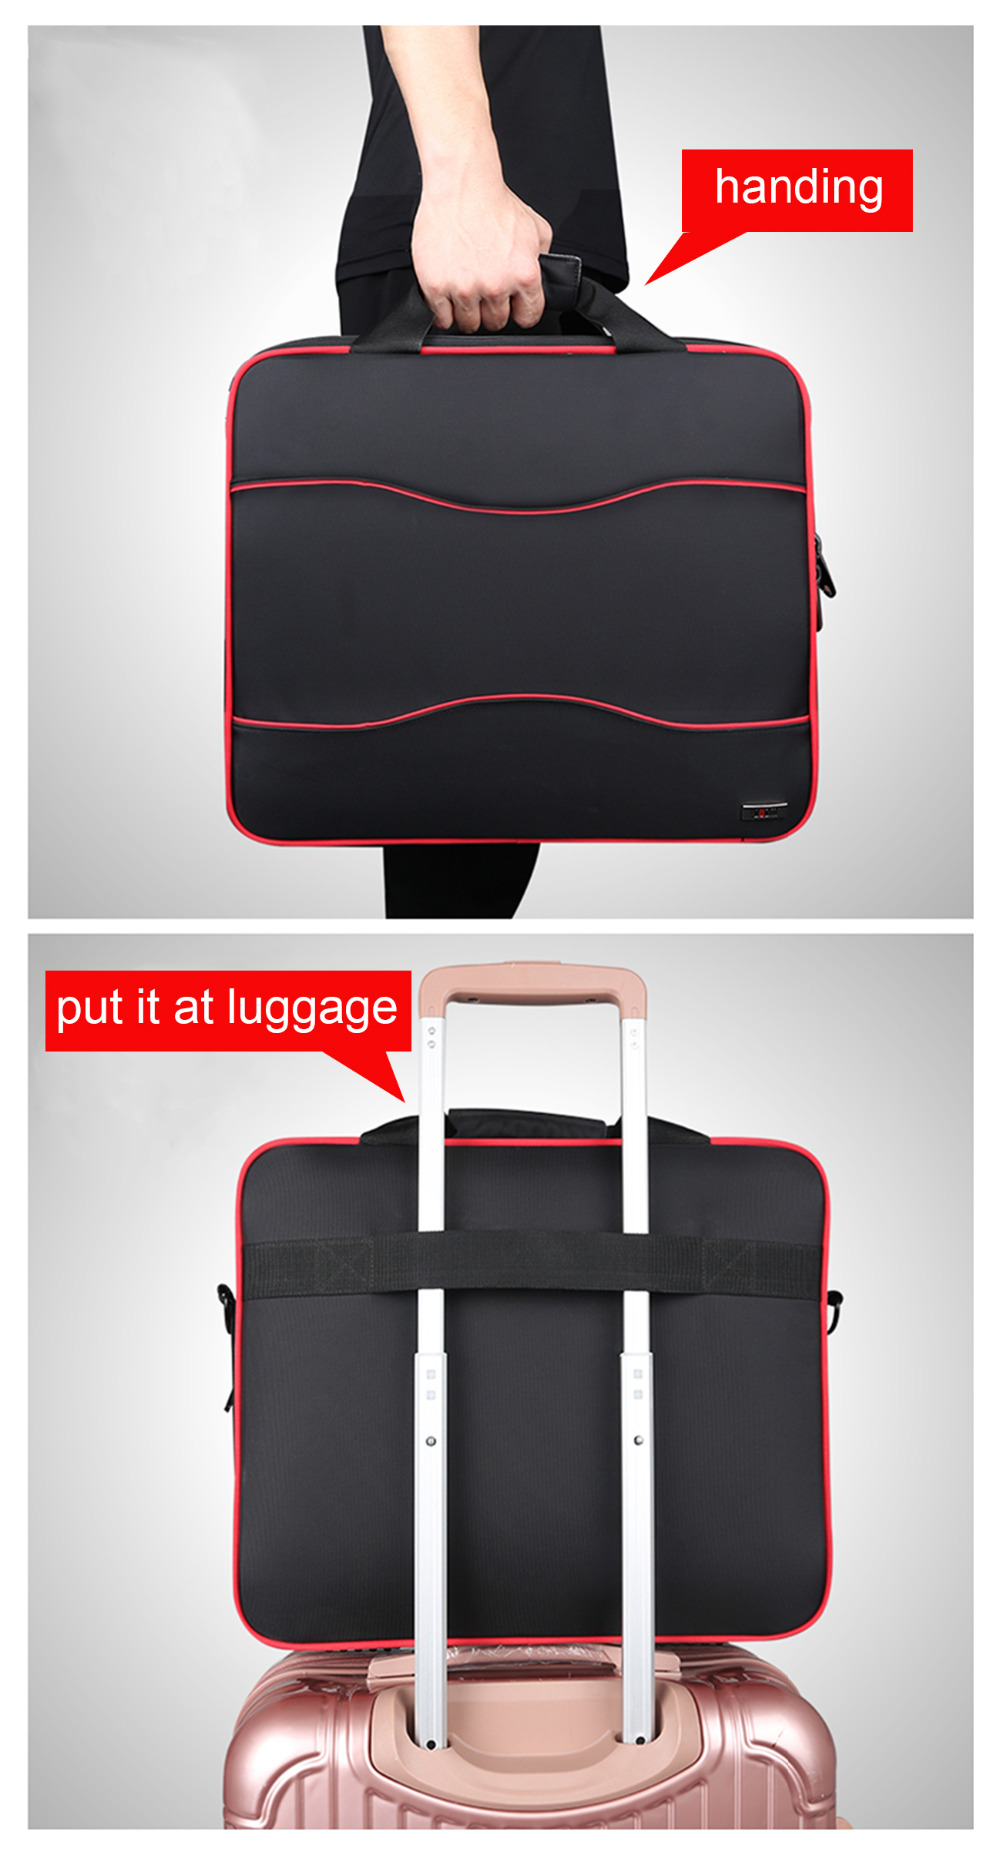 BUBM High Capacity Travel Carry Case Protective Shoulder Bag Handbag For XBOX One, XBOX 360 Fat, XBOX 360 Slim,PS4 Pro